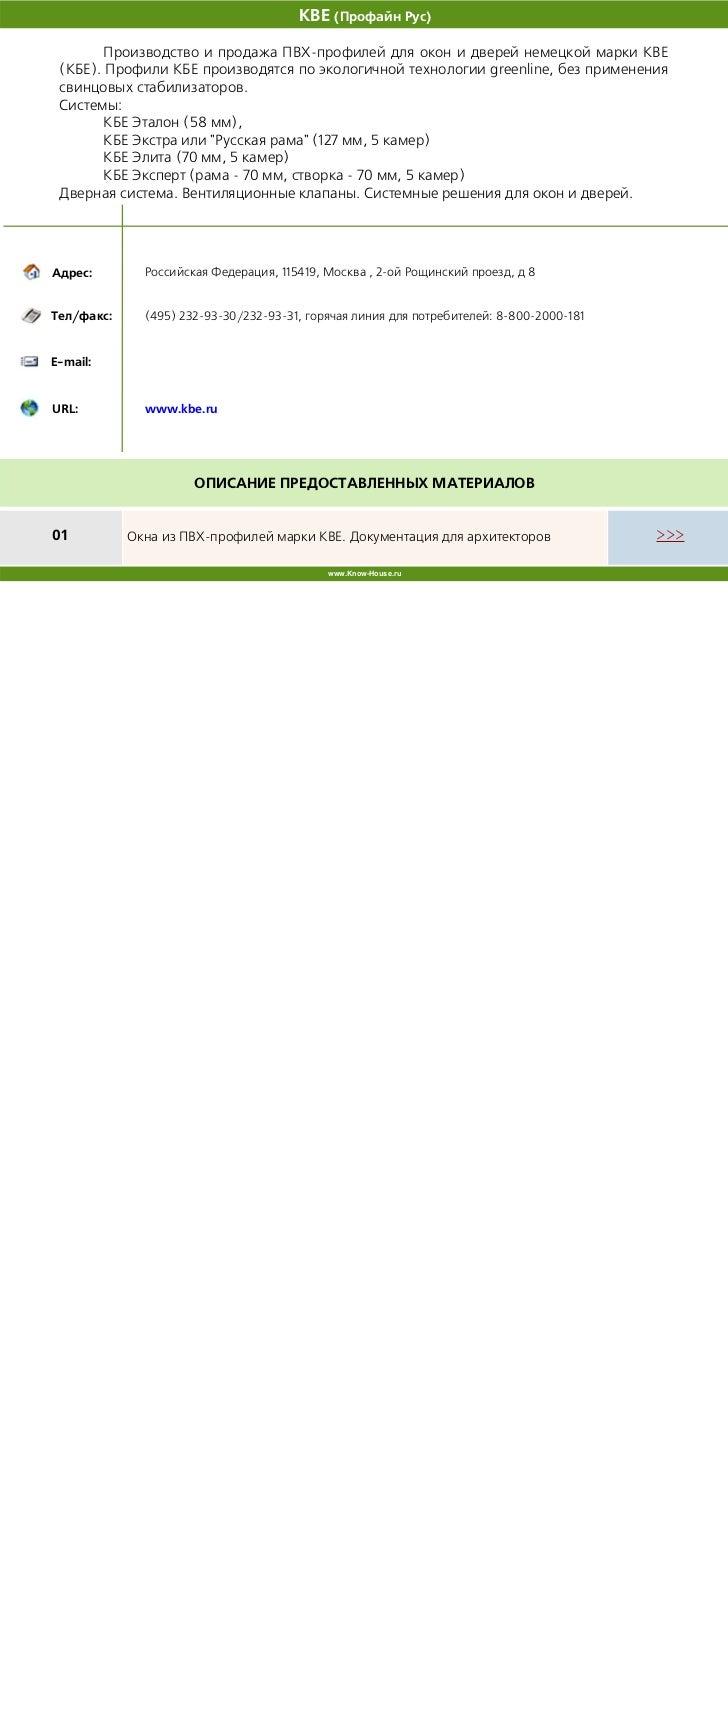 KBE (Профайн Рус)        Производство и продажа ПВХ профилей для окон и дверей немецкой марки KBE (КБЕ). Профили КБЕ произ...